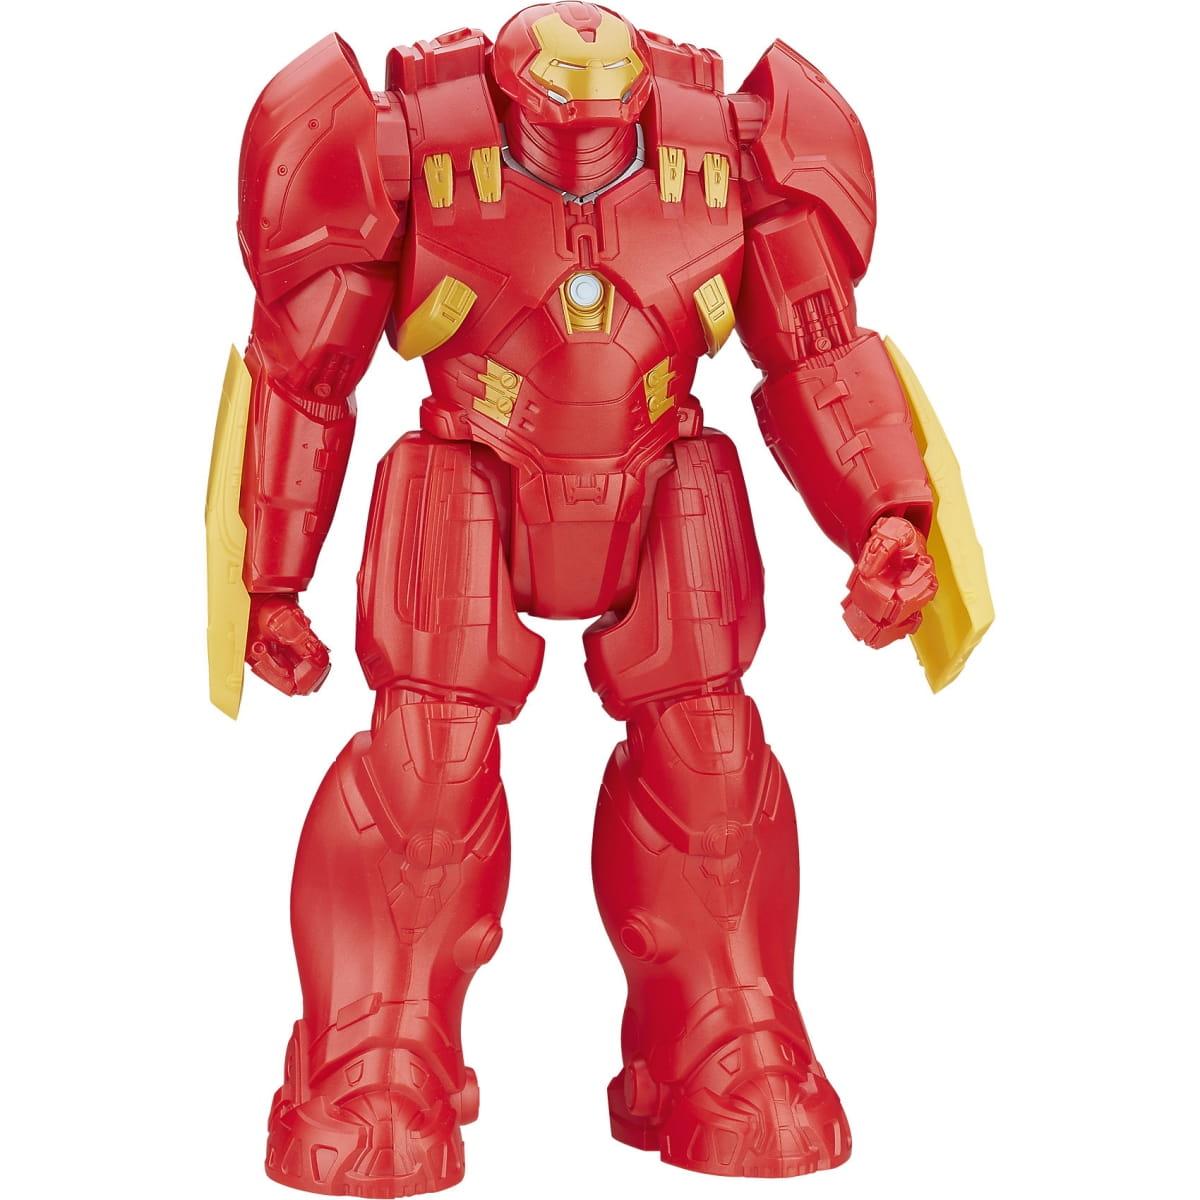 Игровой набор Avengers Мстители Фигурка Халкбастера Титаны (Hasbro)